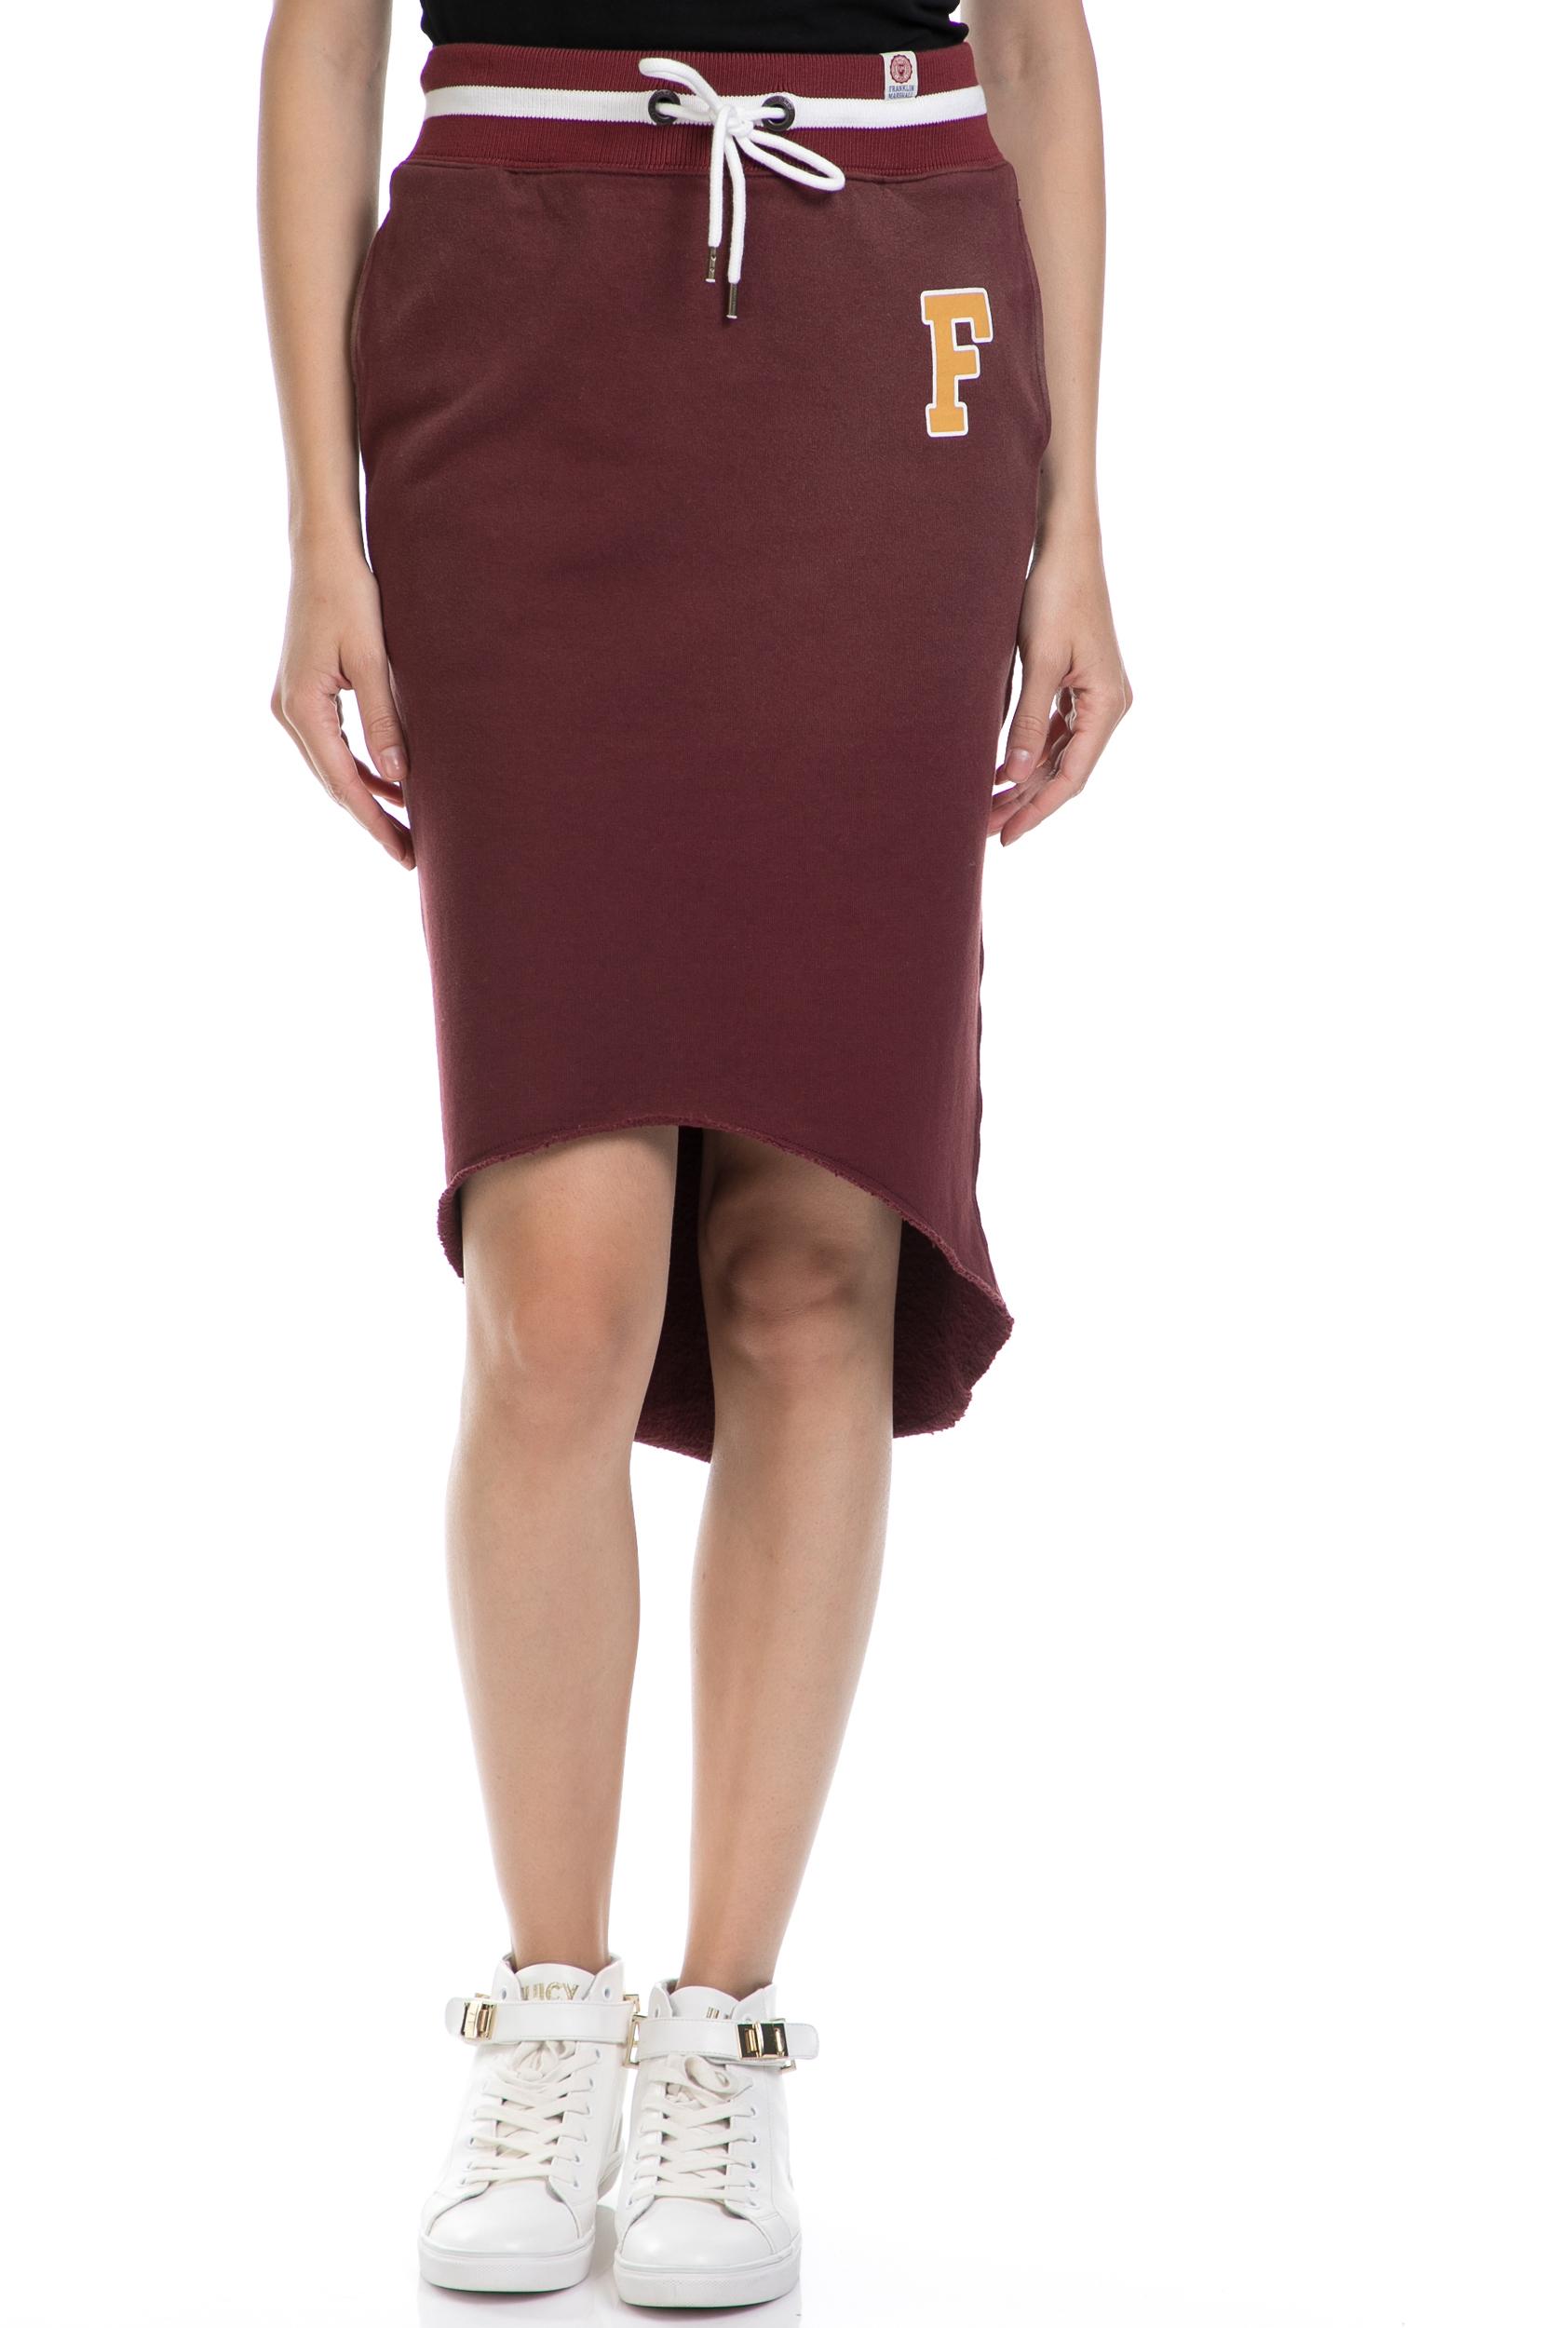 FRANKLIN & MARSHALL – Γυναικεία φούστα FRANKLIN & MARSHALL μπορντώ